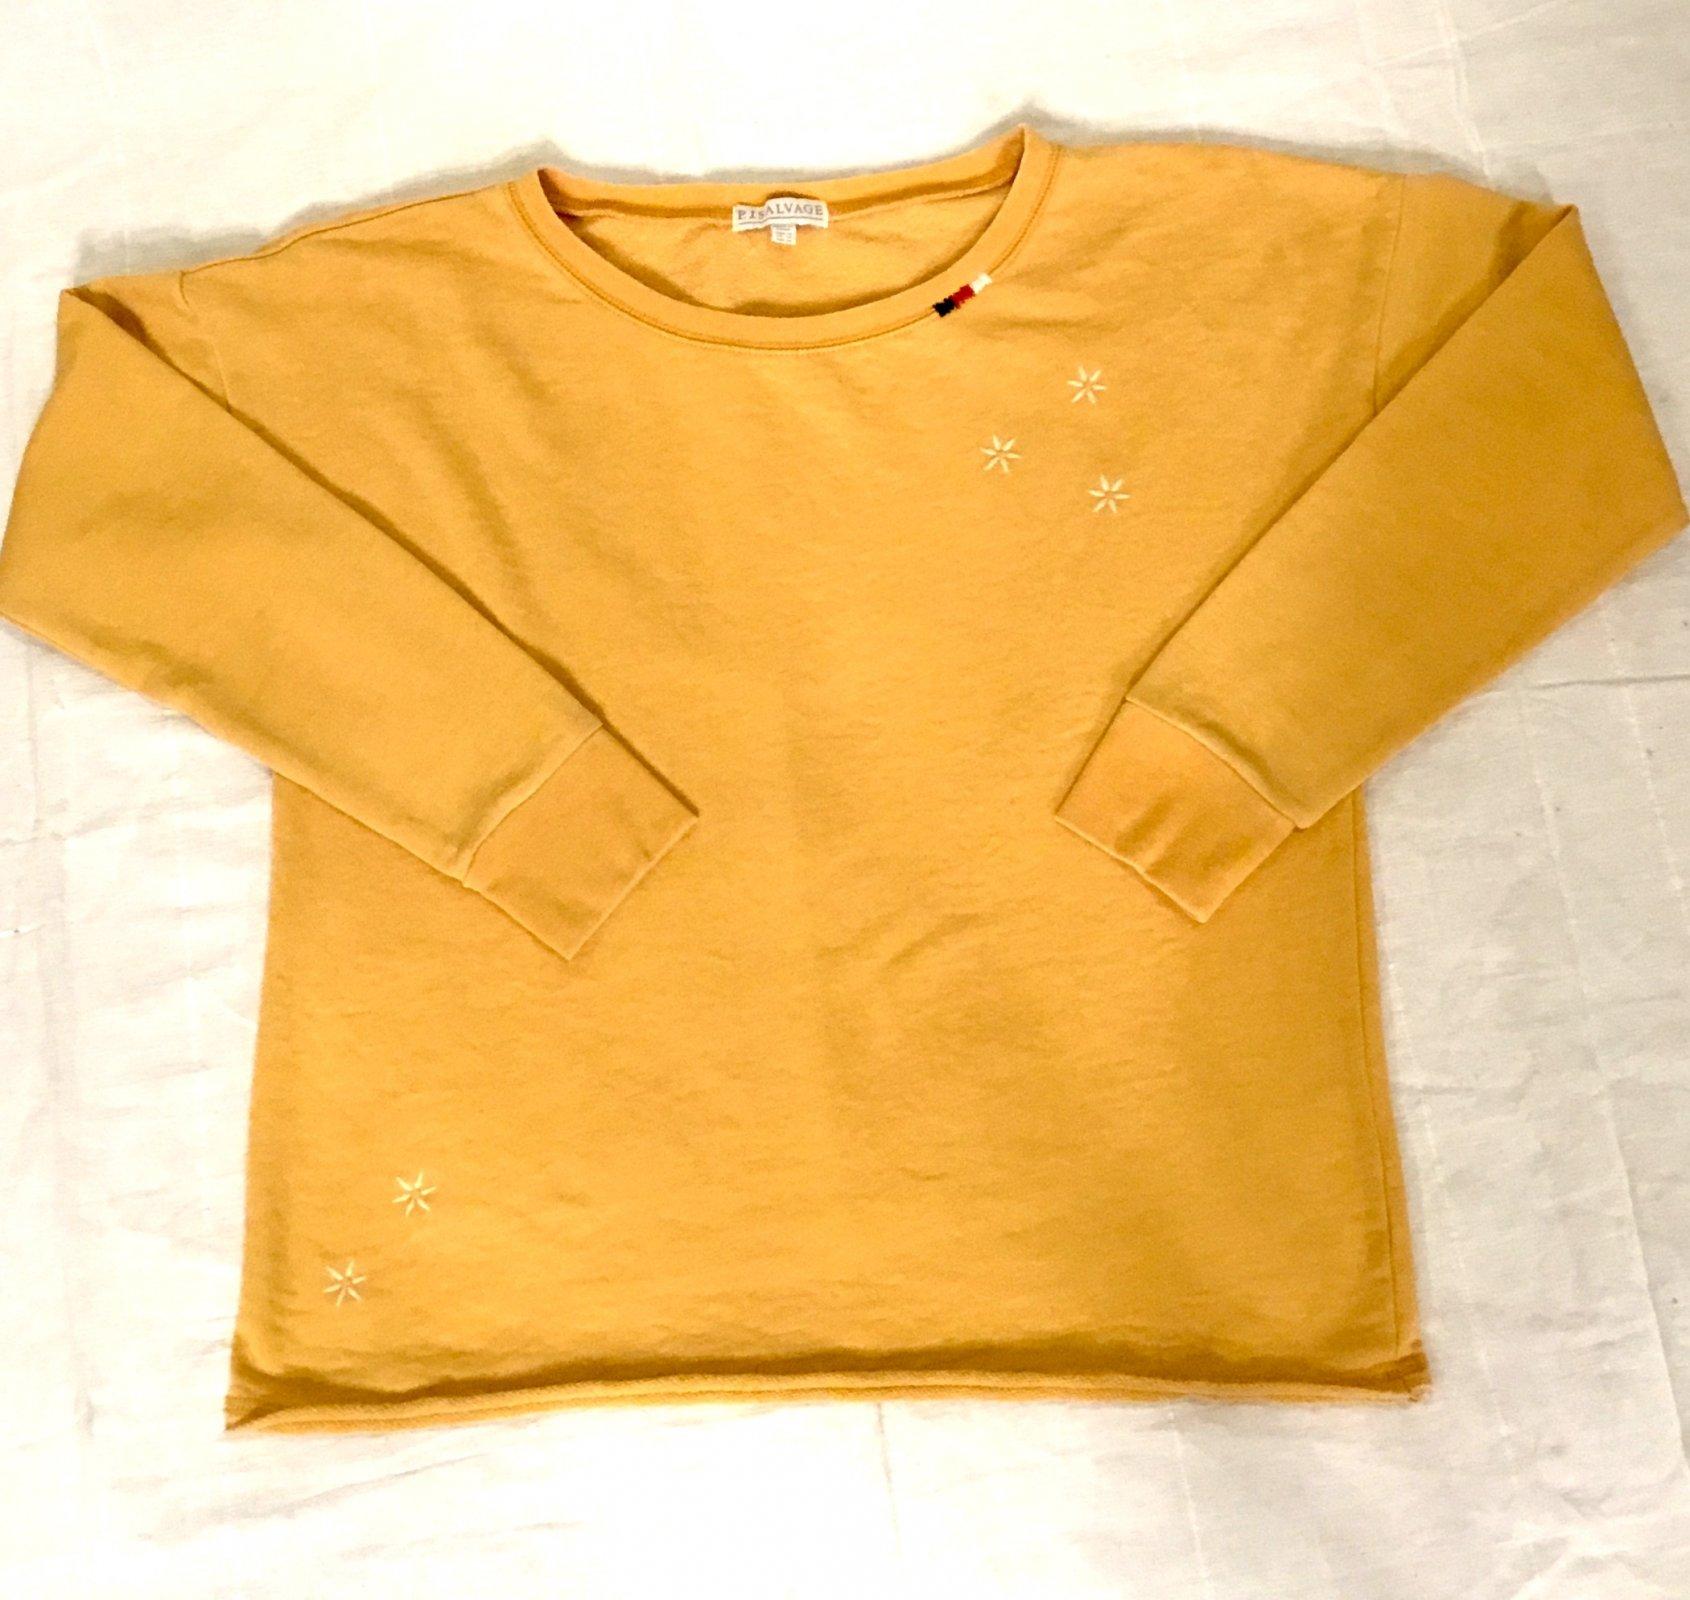 PJ Salvage Sweatshirt - Mustard